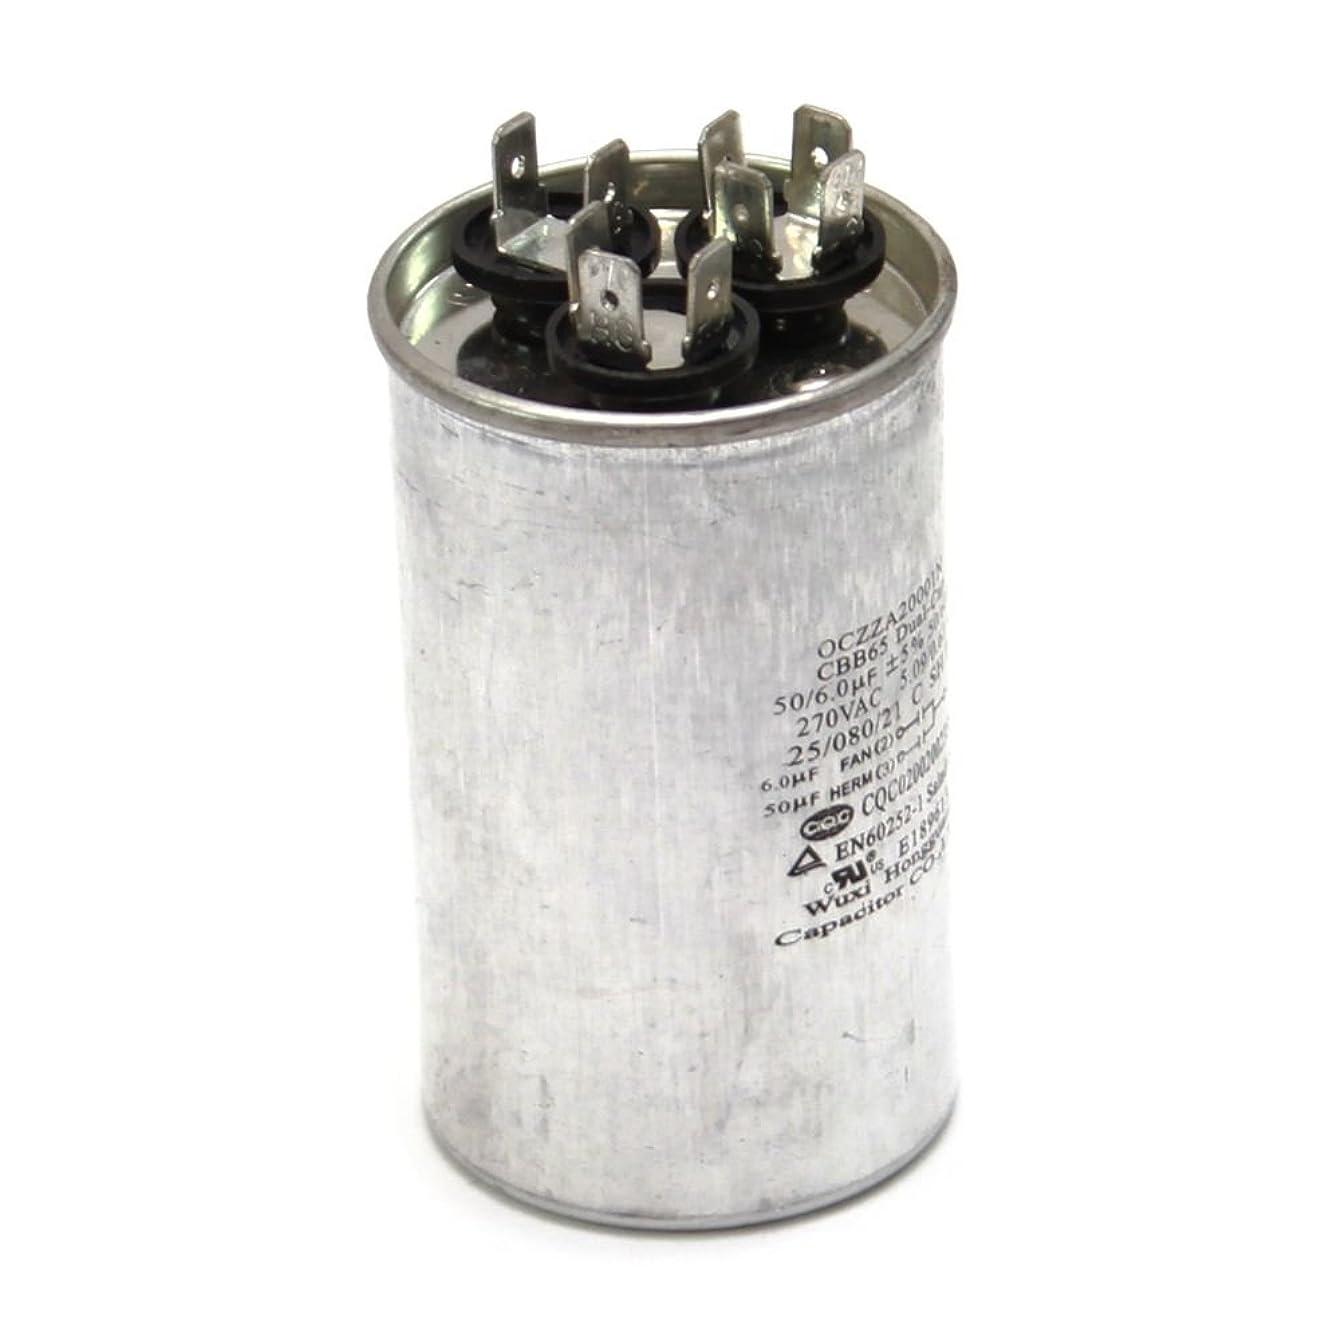 Lg 0CZZA20001N Room Air Conditioner Fan Motor Capacitor Genuine Original Equipment Manufacturer (OEM) Part